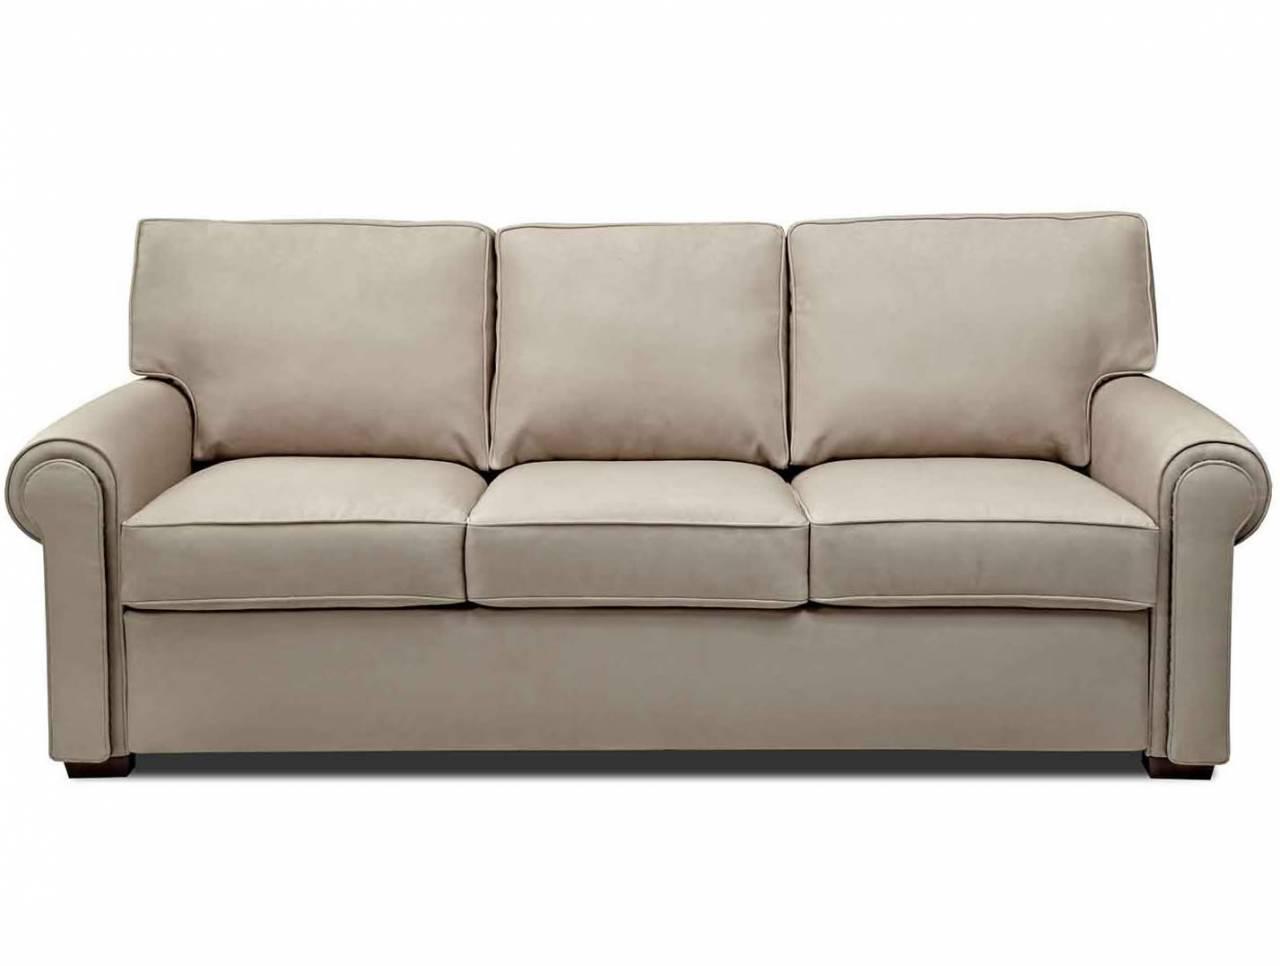 sofa and chairs bloomington mn bentley italian leather sectional reese sleeper sofas of minnesota